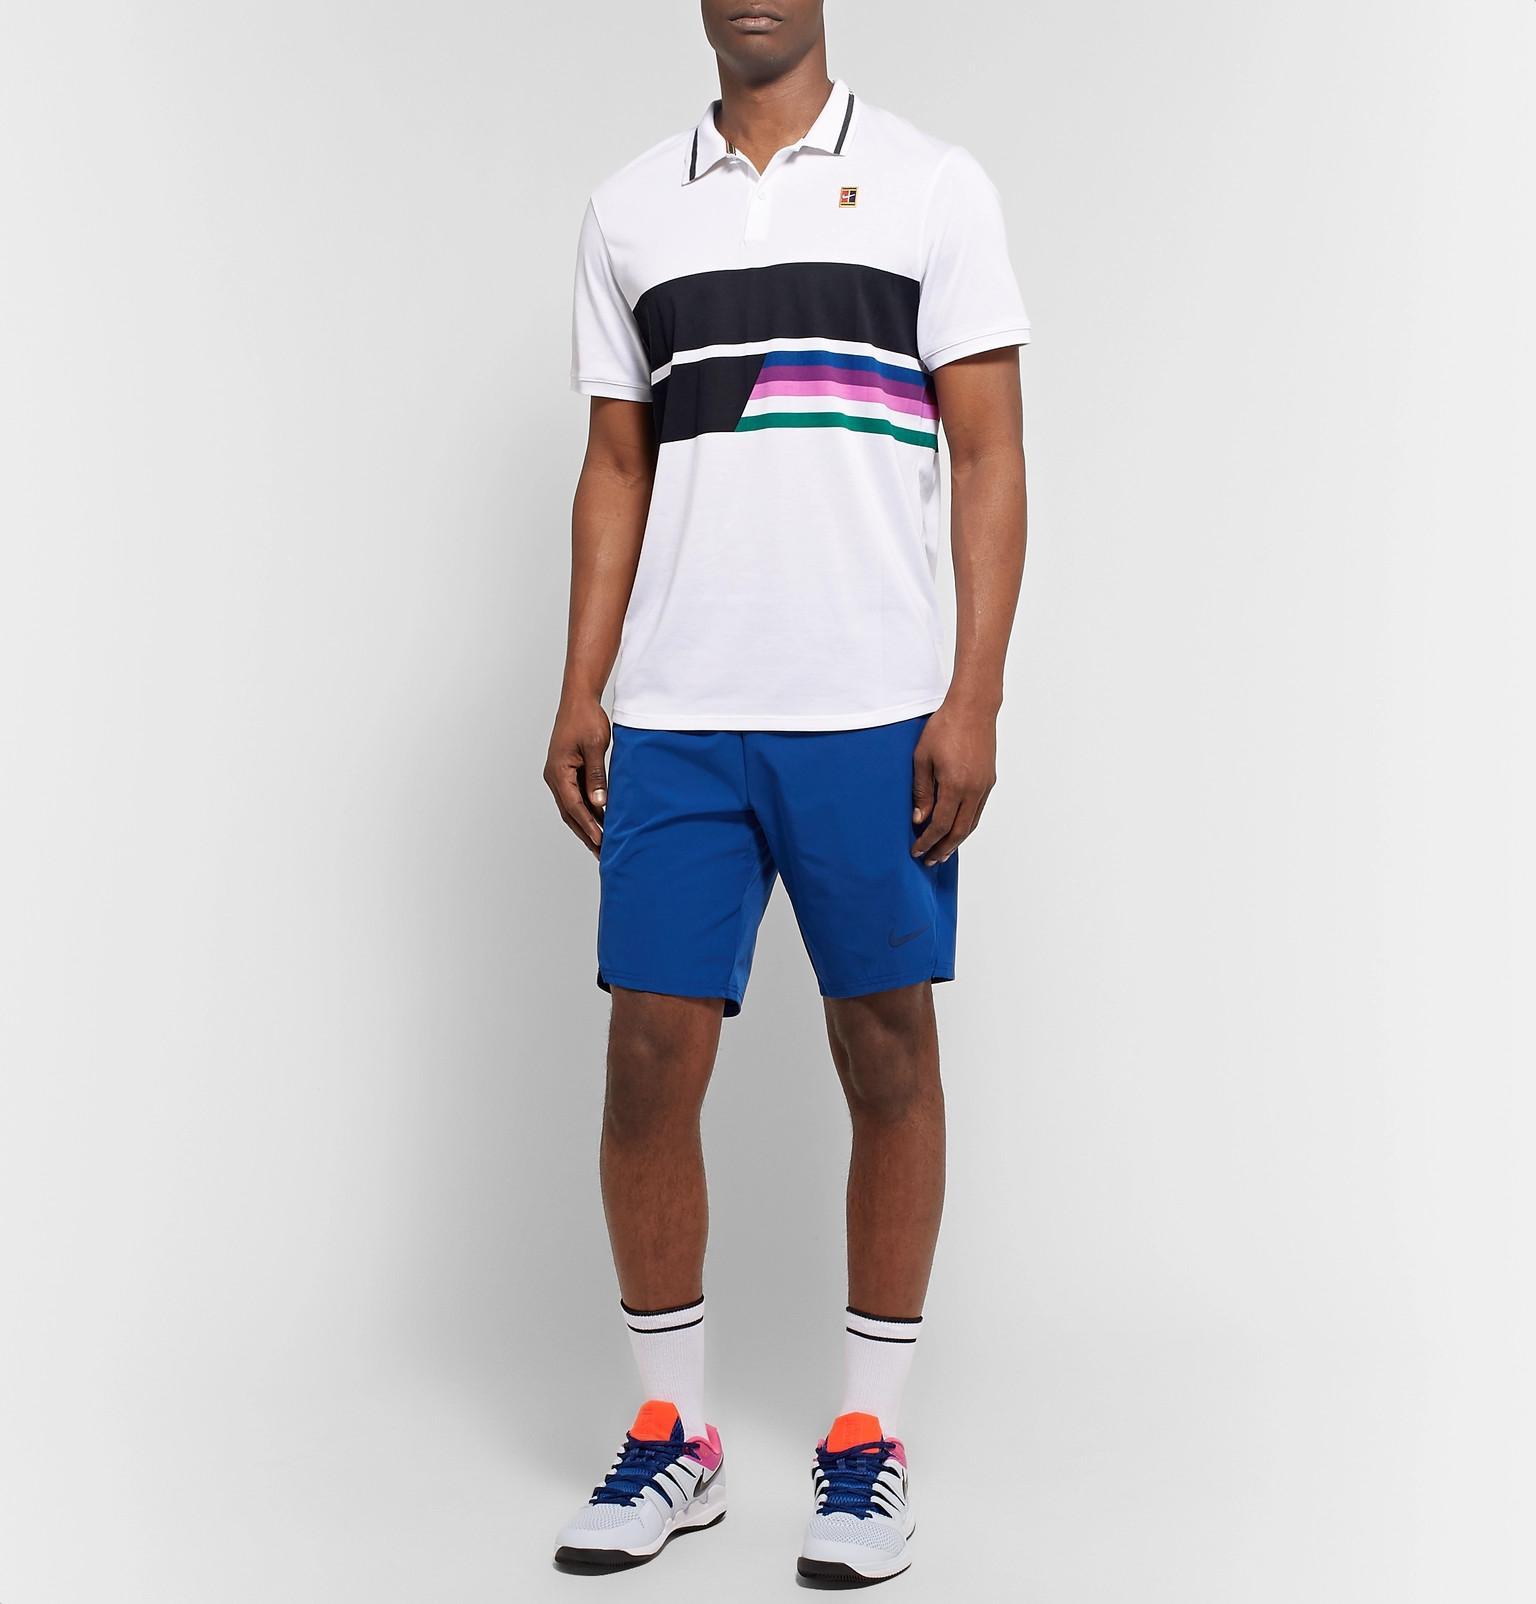 ae56340e6 Nike - White Nikecourt Advantage Printed Dri-fit Tennis Polo Shirt for Men  - Lyst. View fullscreen